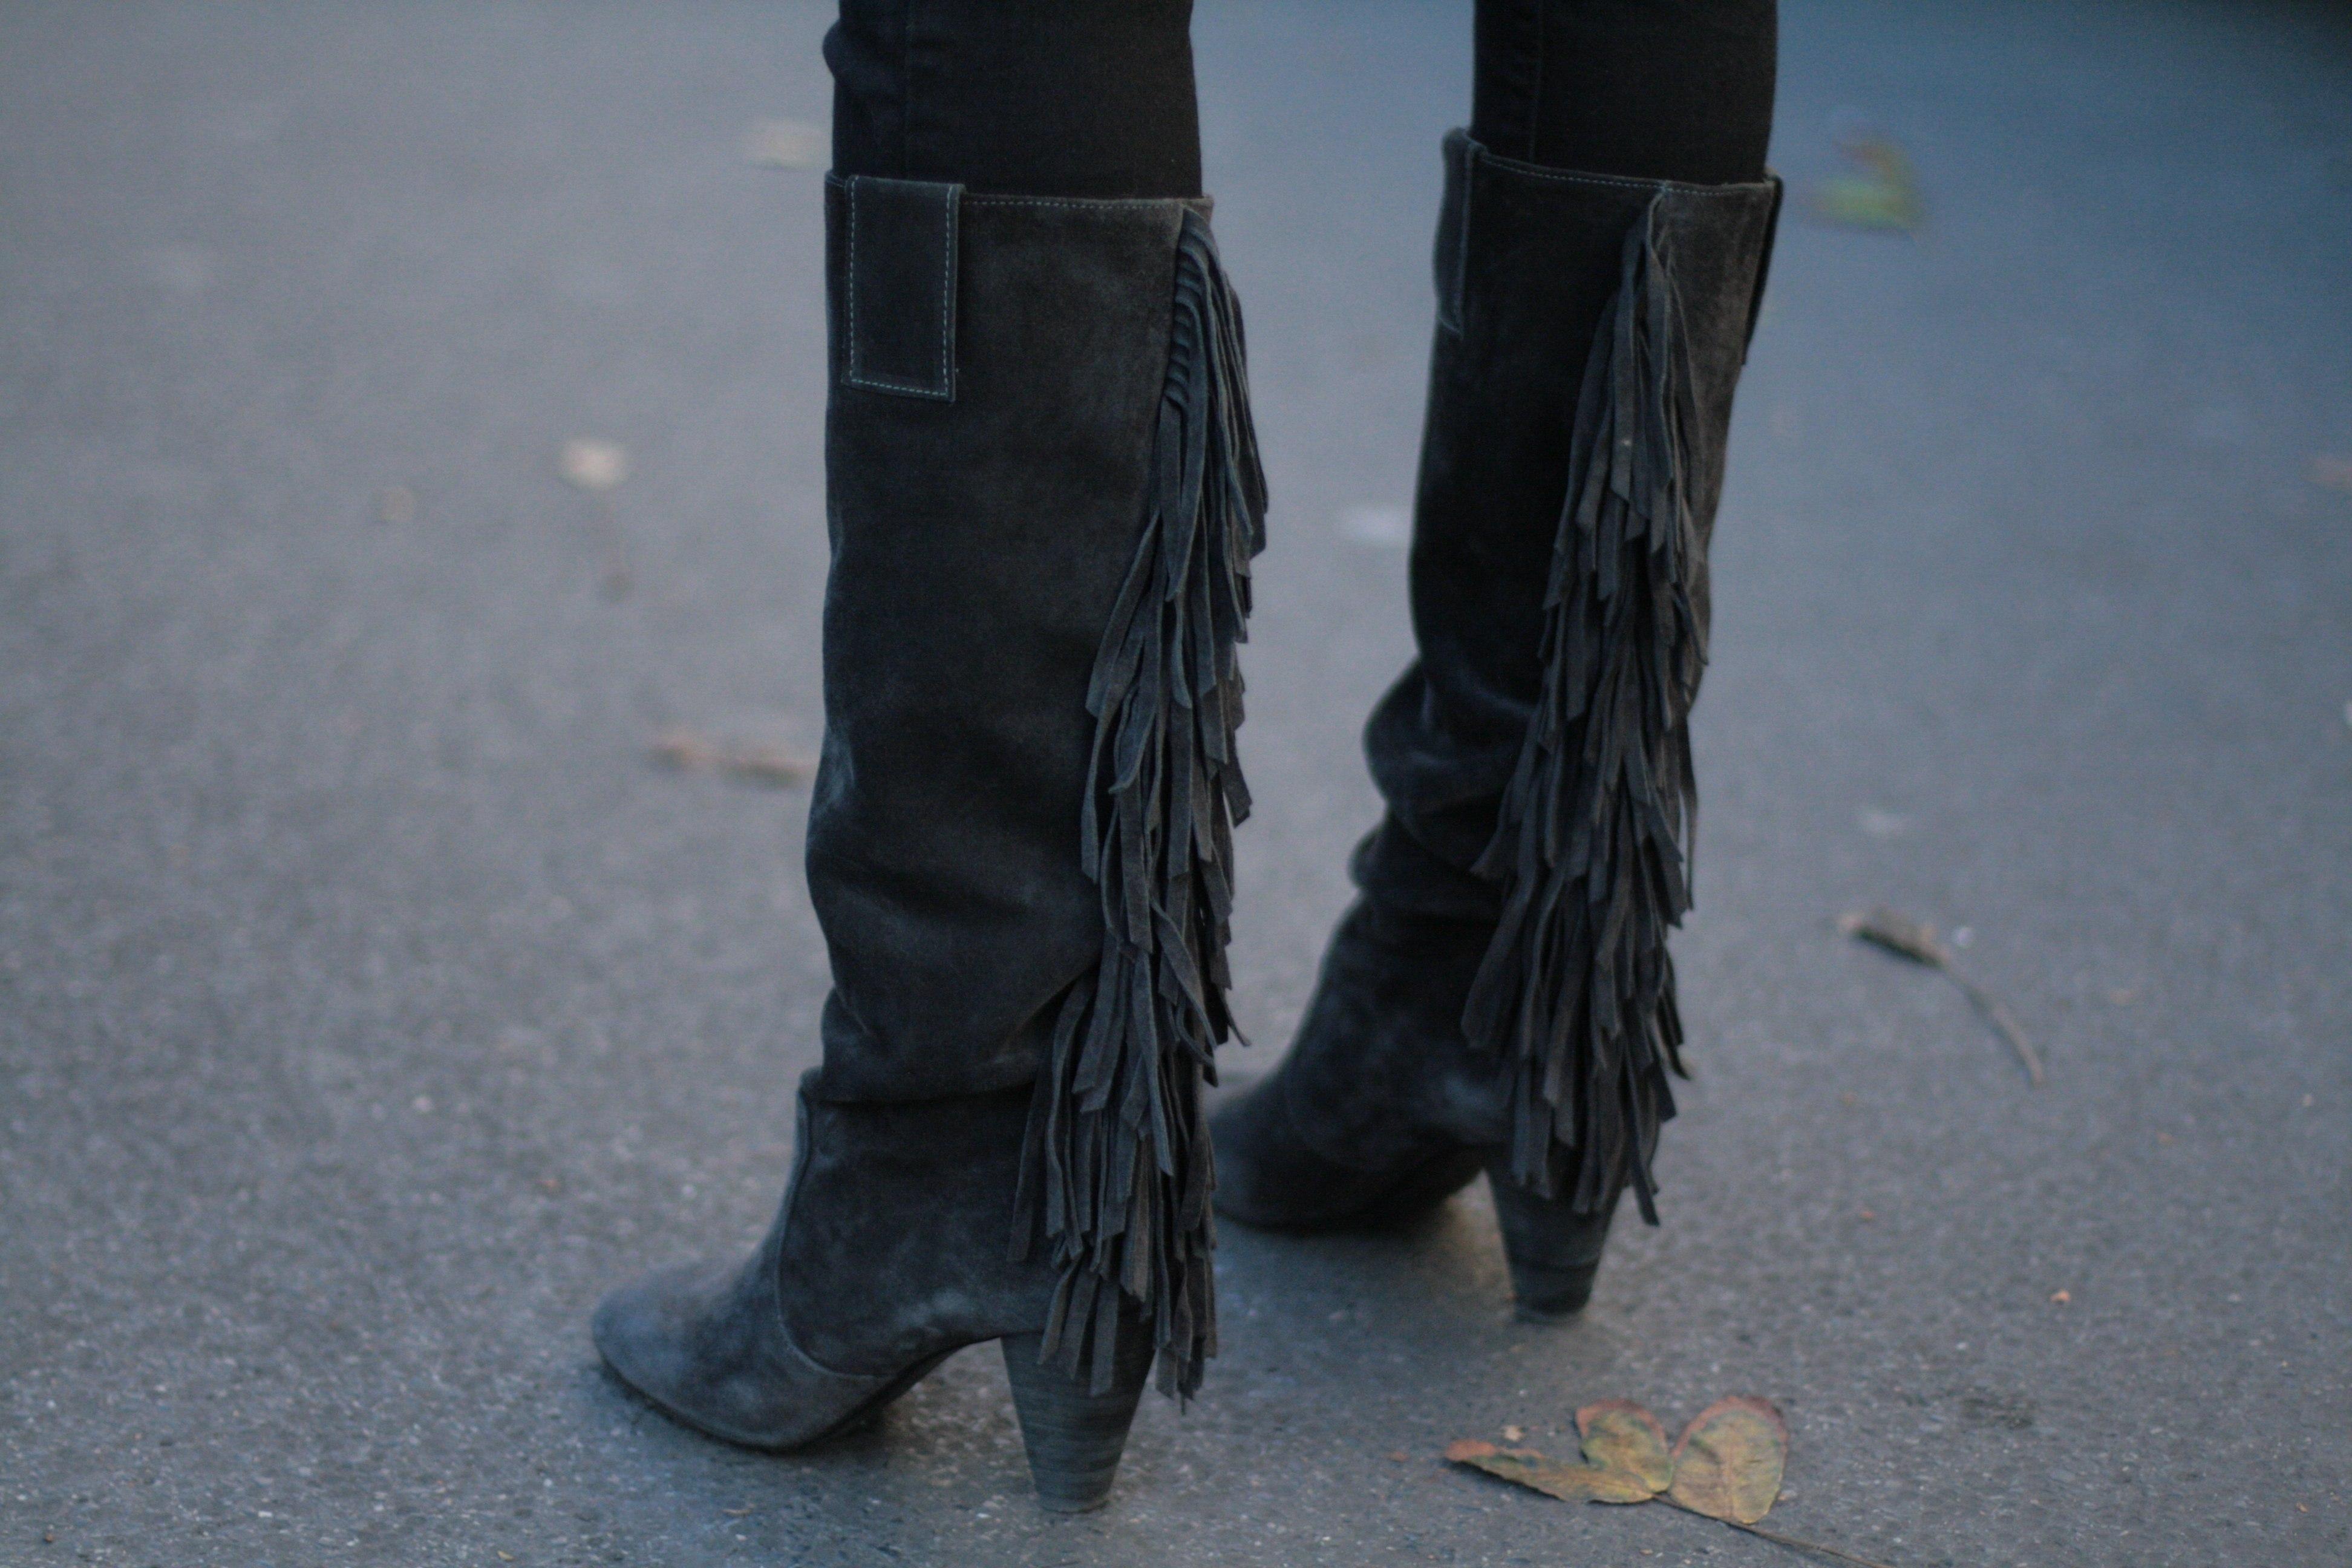 bottines isabel marant ebay Soldes France - vente de chaussures de ... f8e3d8caf540